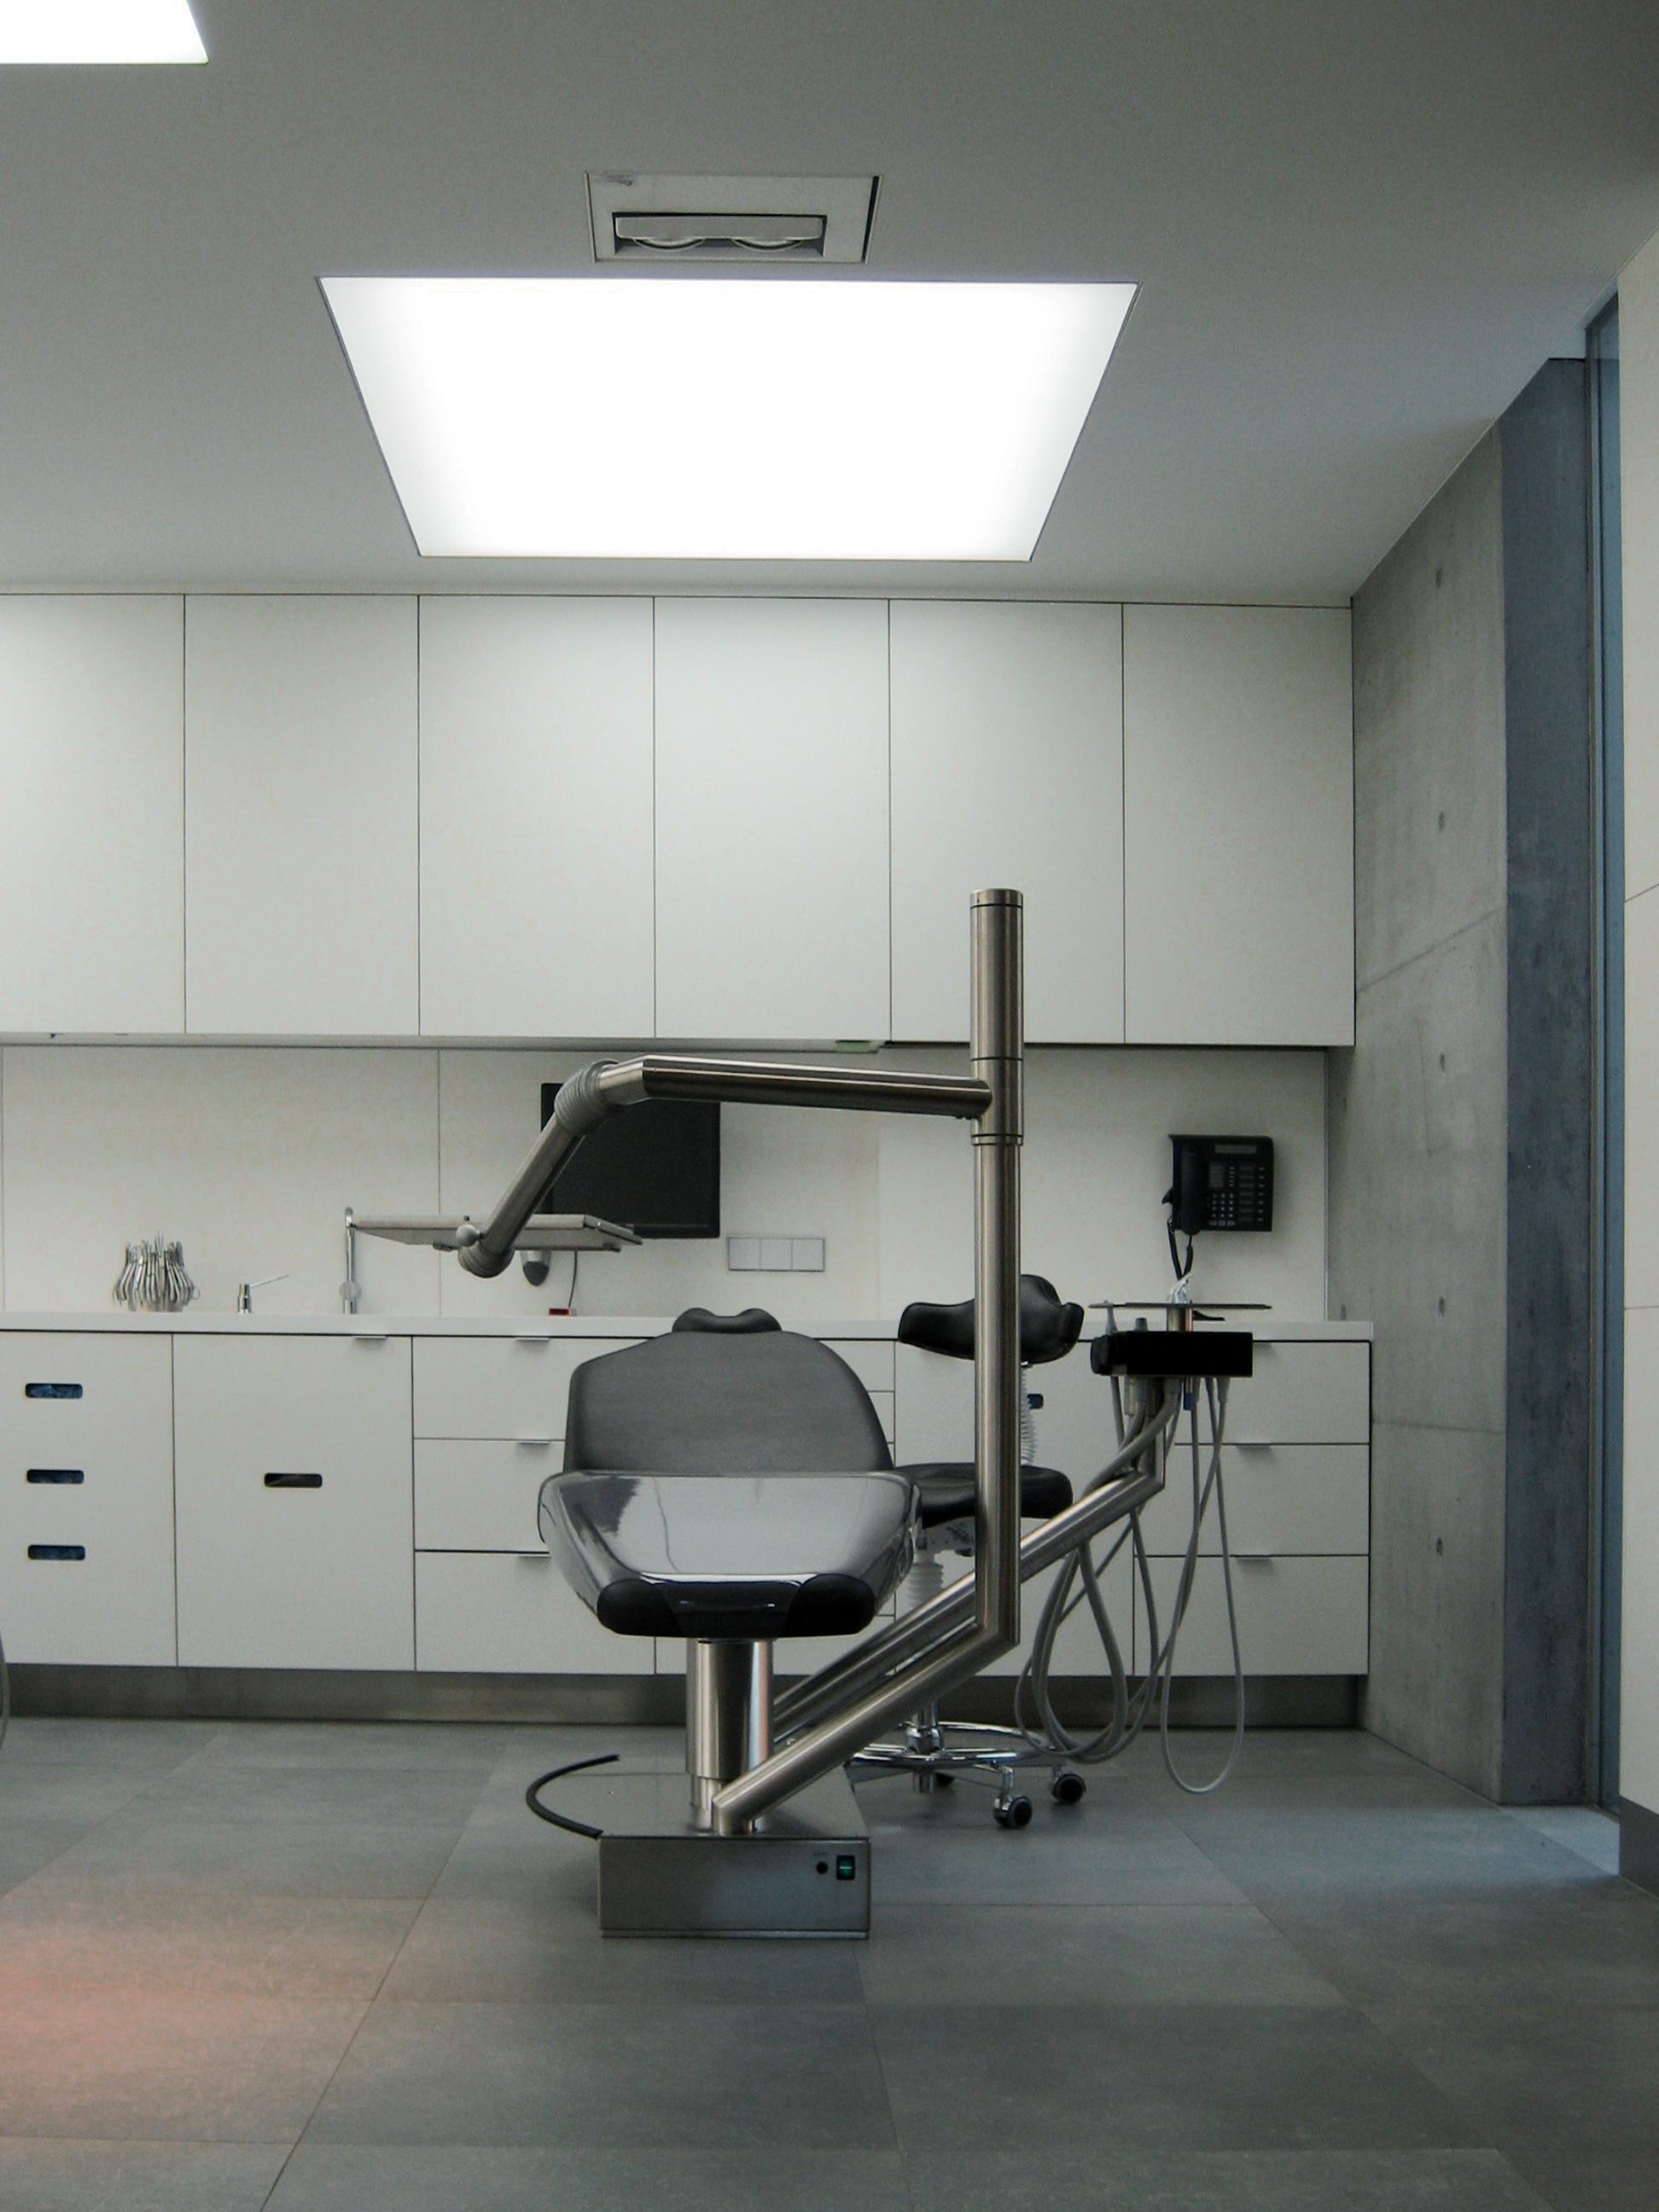 dentist office design. Dental Office Design, Designs, Ideas, Medicine, Orthodontics, Interior Desk Medical Science, Dentist Design D